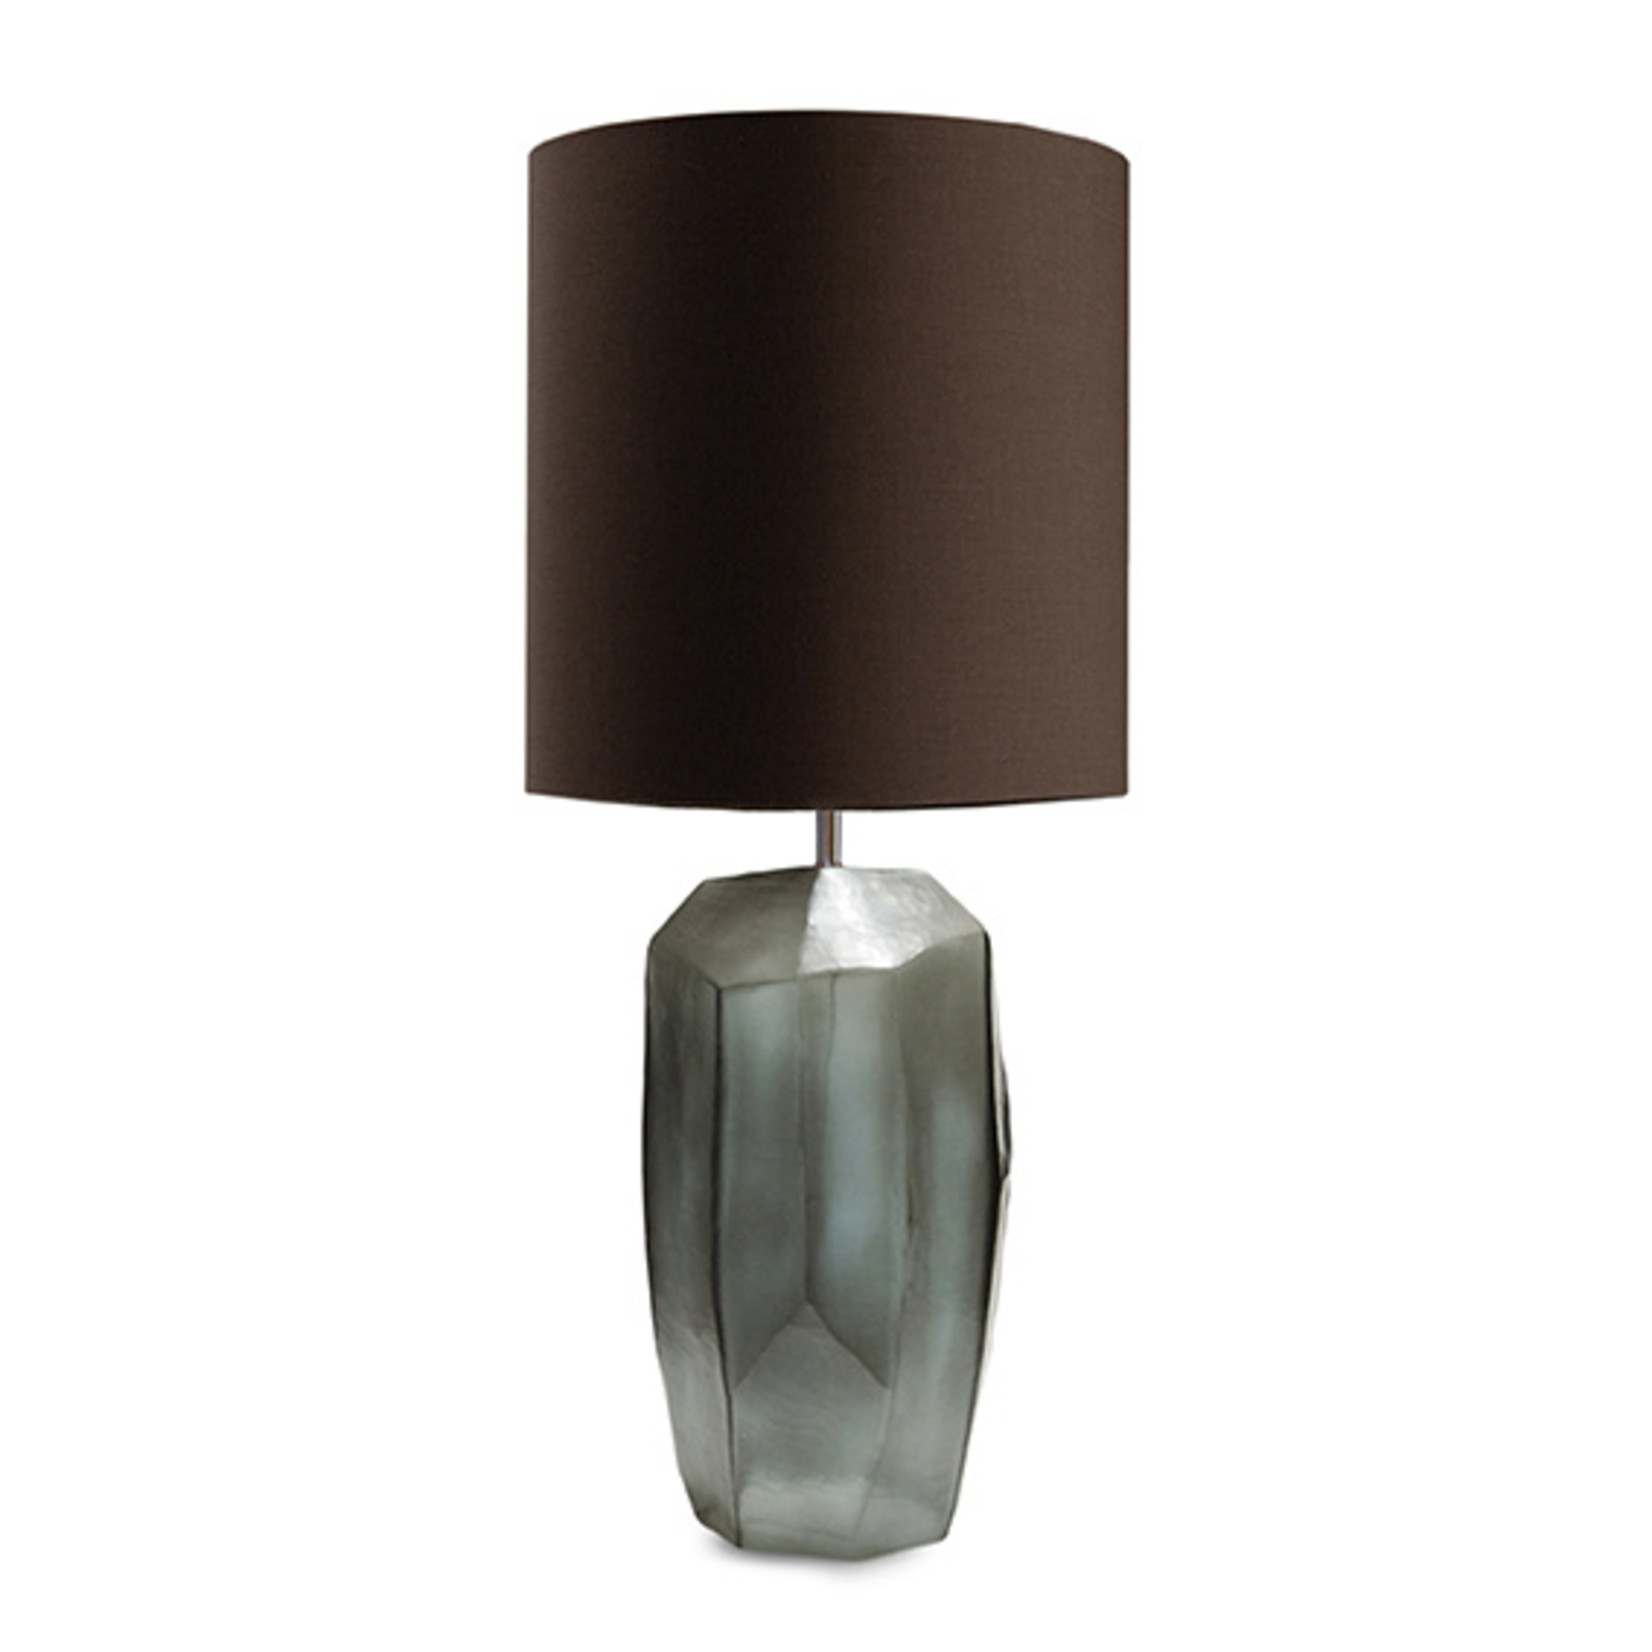 Guaxs Tafellamp Cubistic Tall | Indigo / Smokegrey